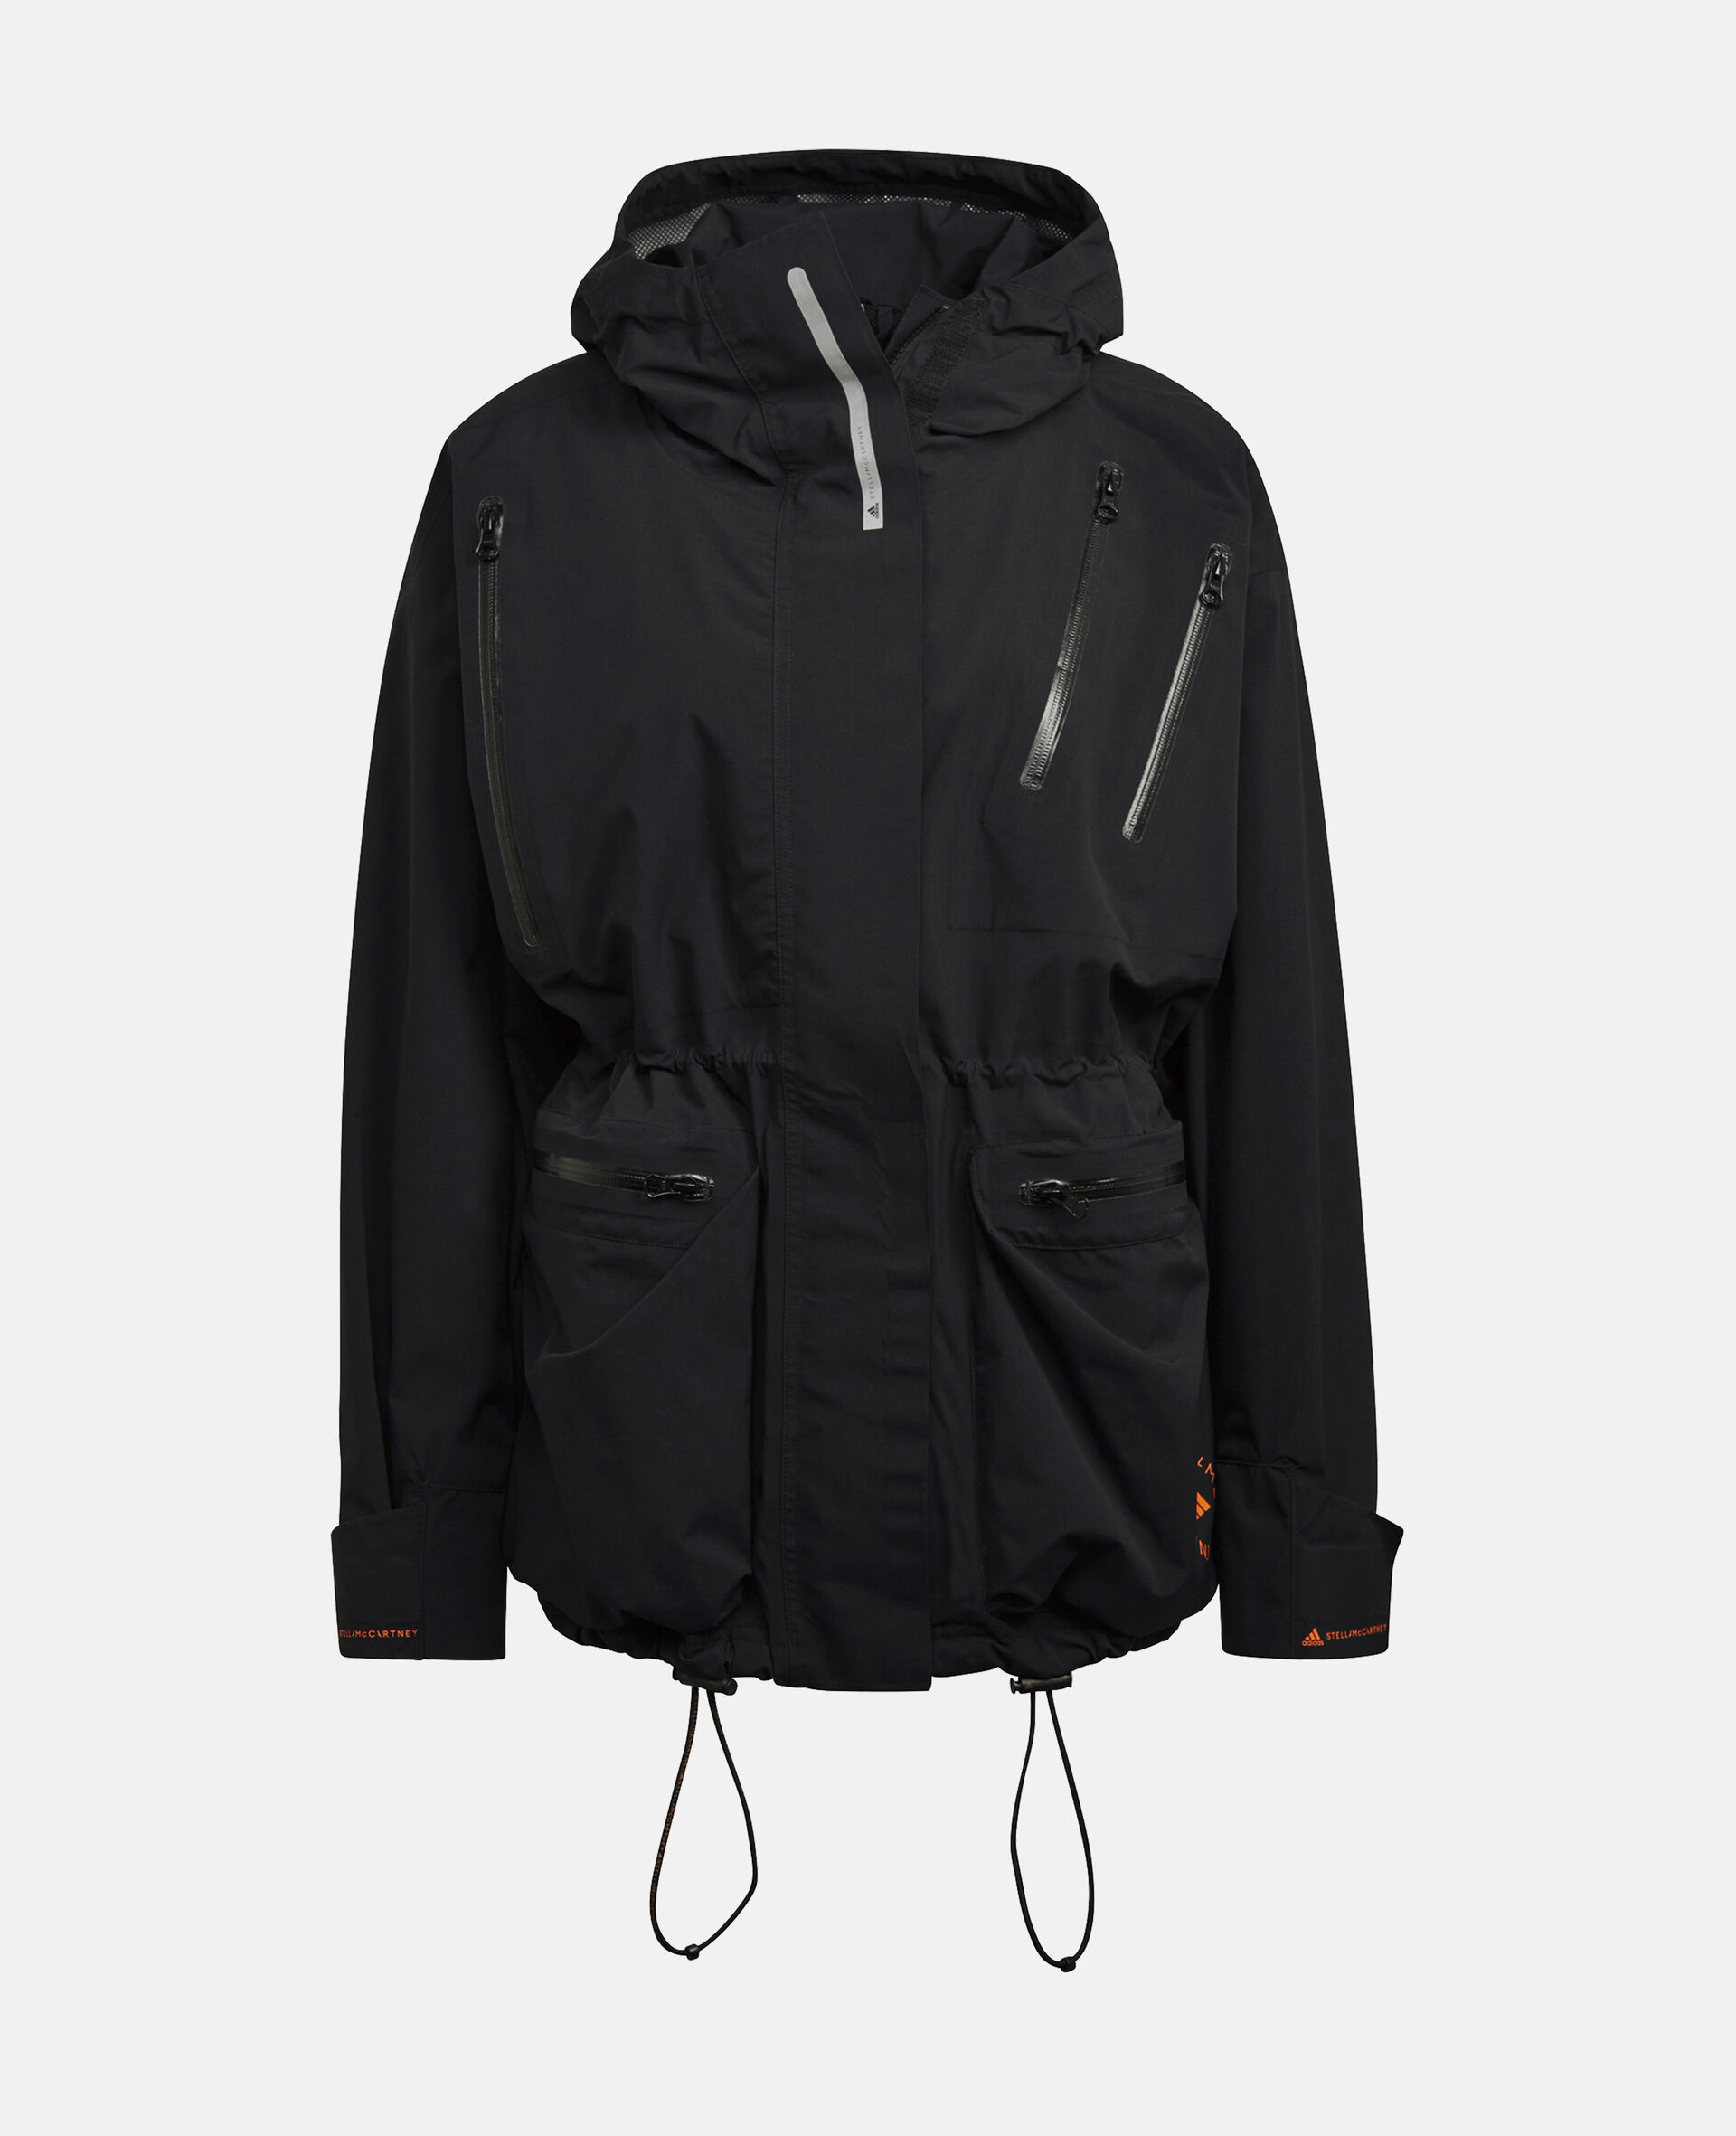 Black Gore-Tex Training Jacket-Black-large image number 0